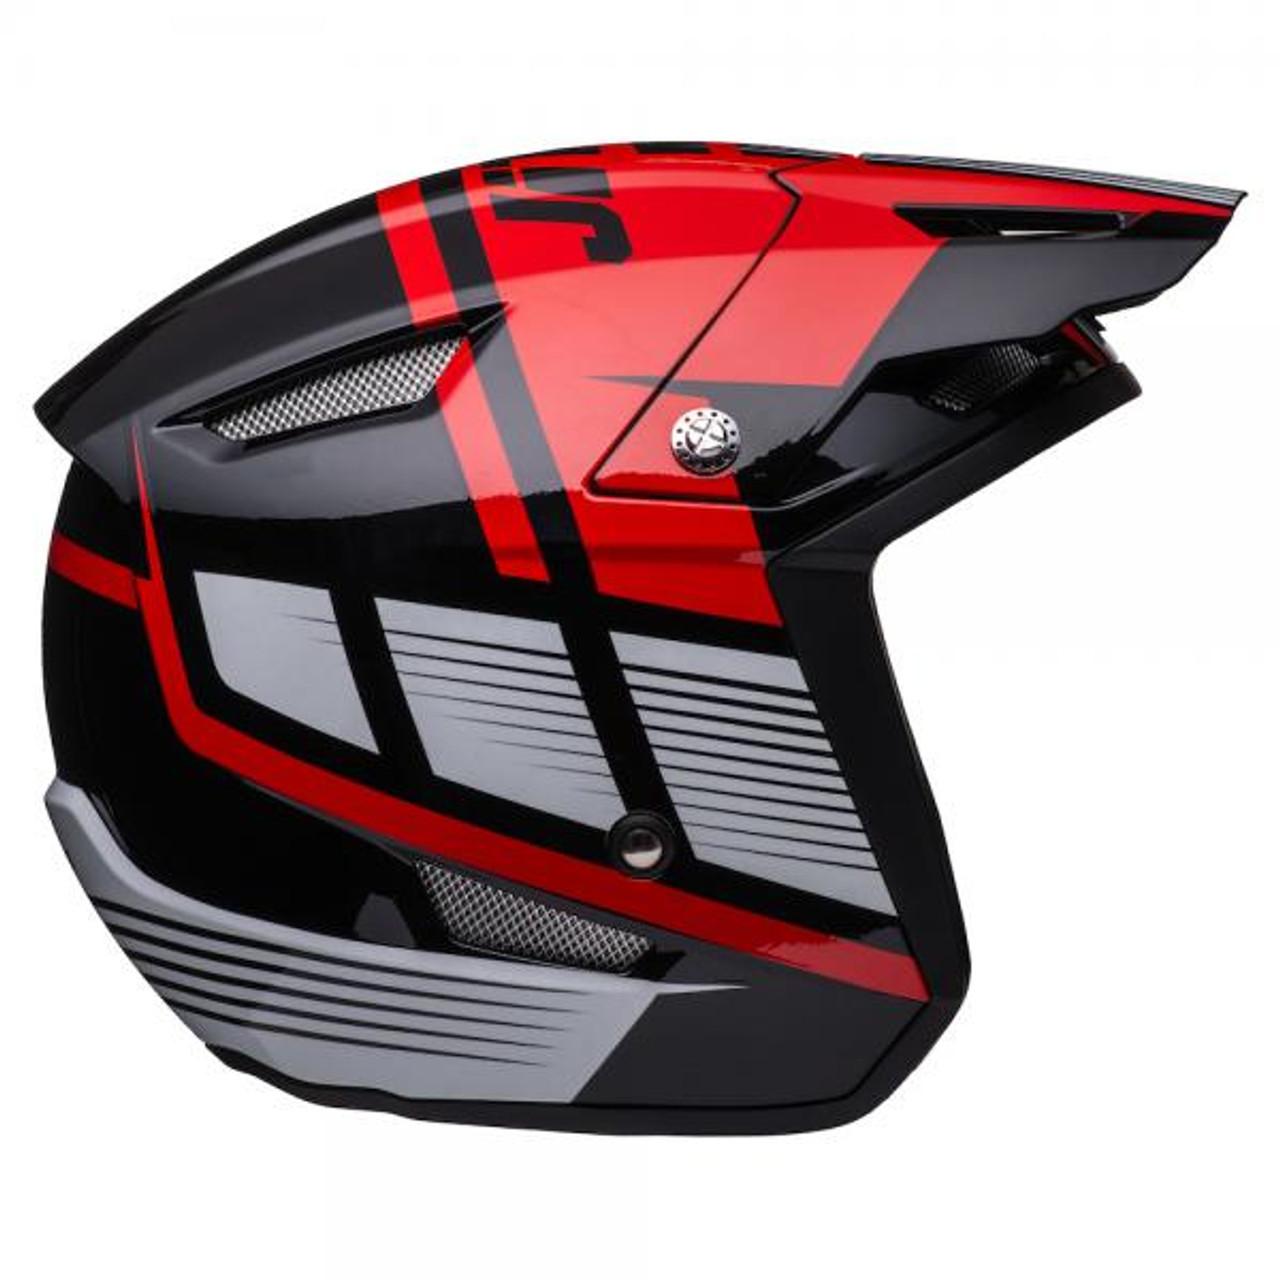 Helmet HT1 Struktur, black/ red/ silver